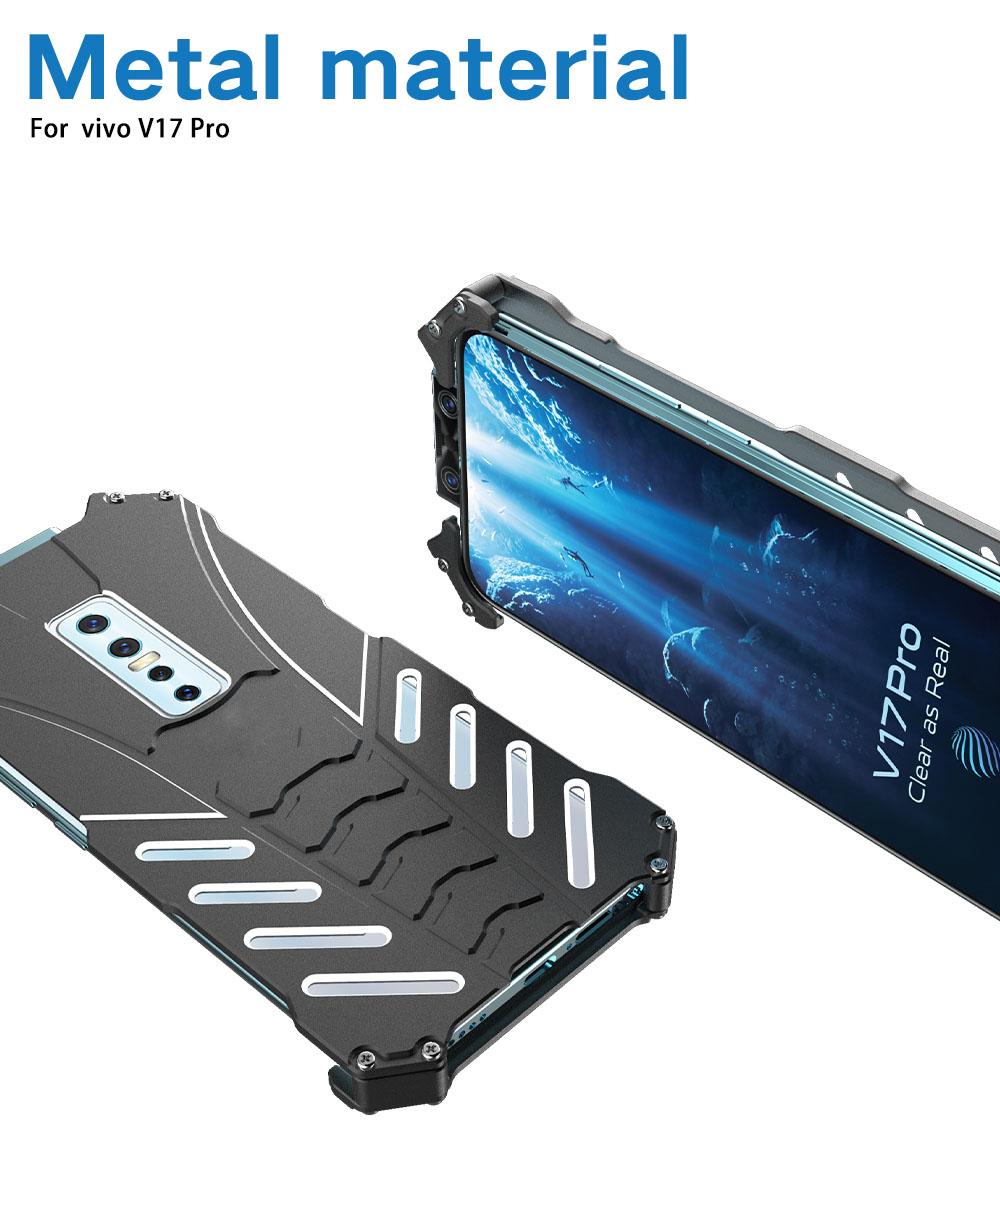 ViVO V17 Pro case